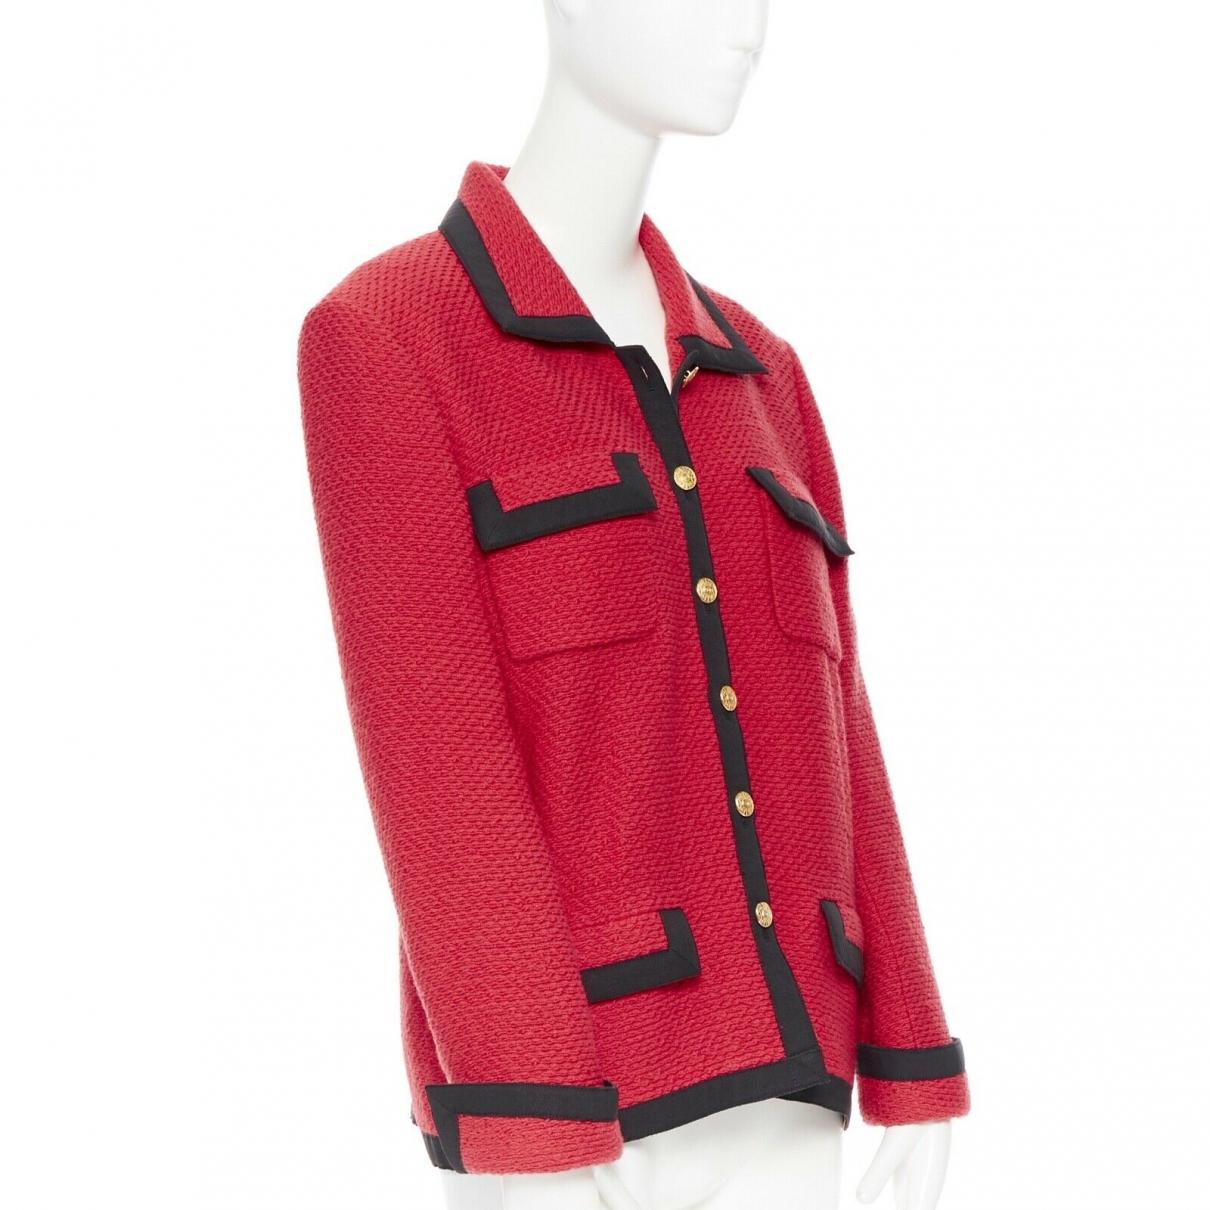 Chanel \N Jacke in  Rot Wolle